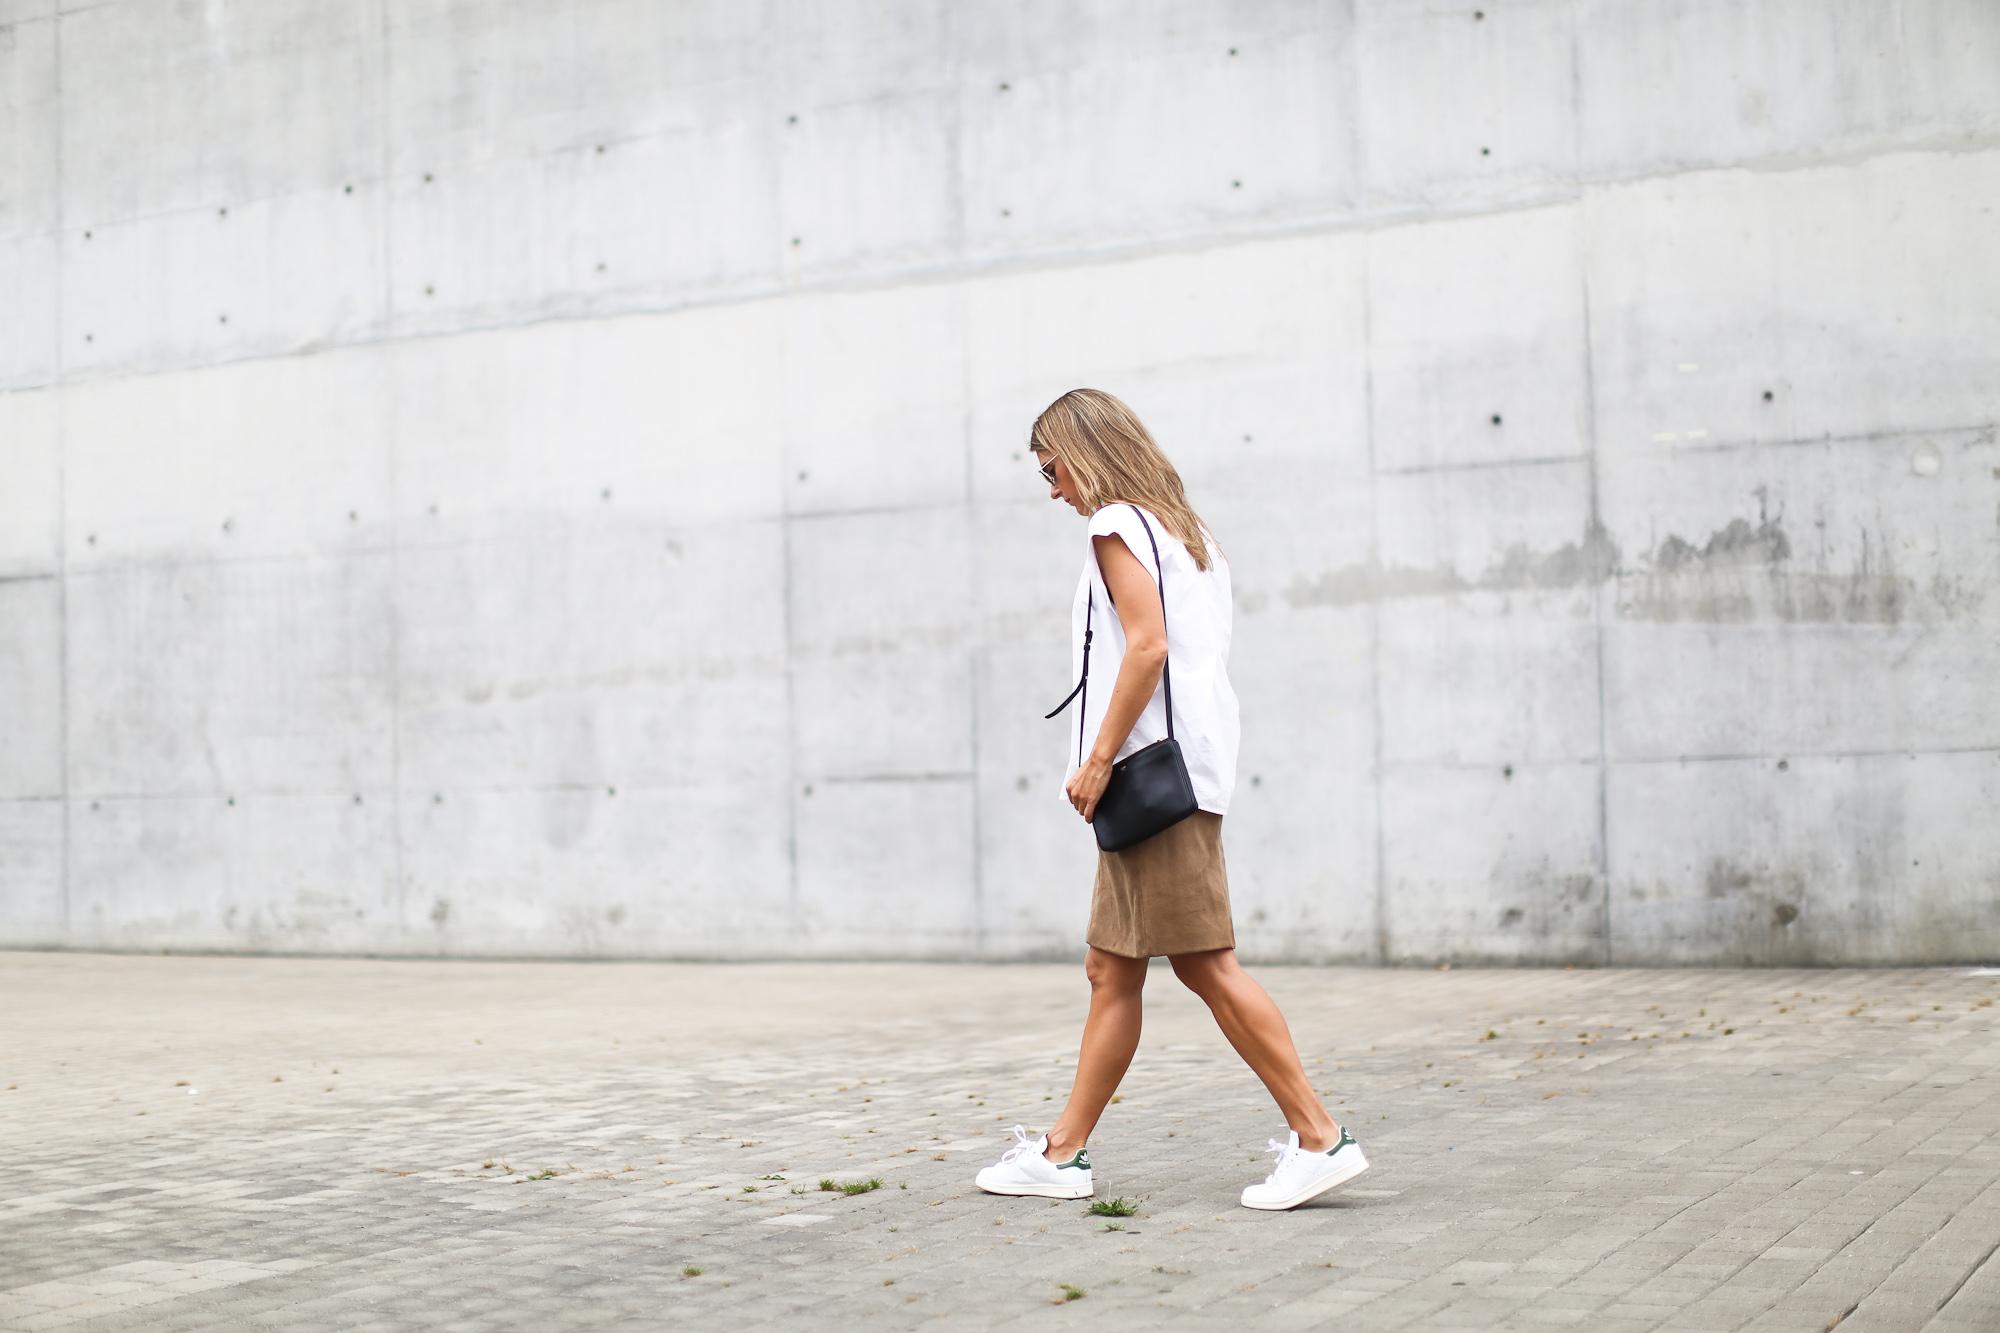 Clochet_suede_skirt_white_shirt_adidas_stan_smith_leztinstreet_celine_trio_bag